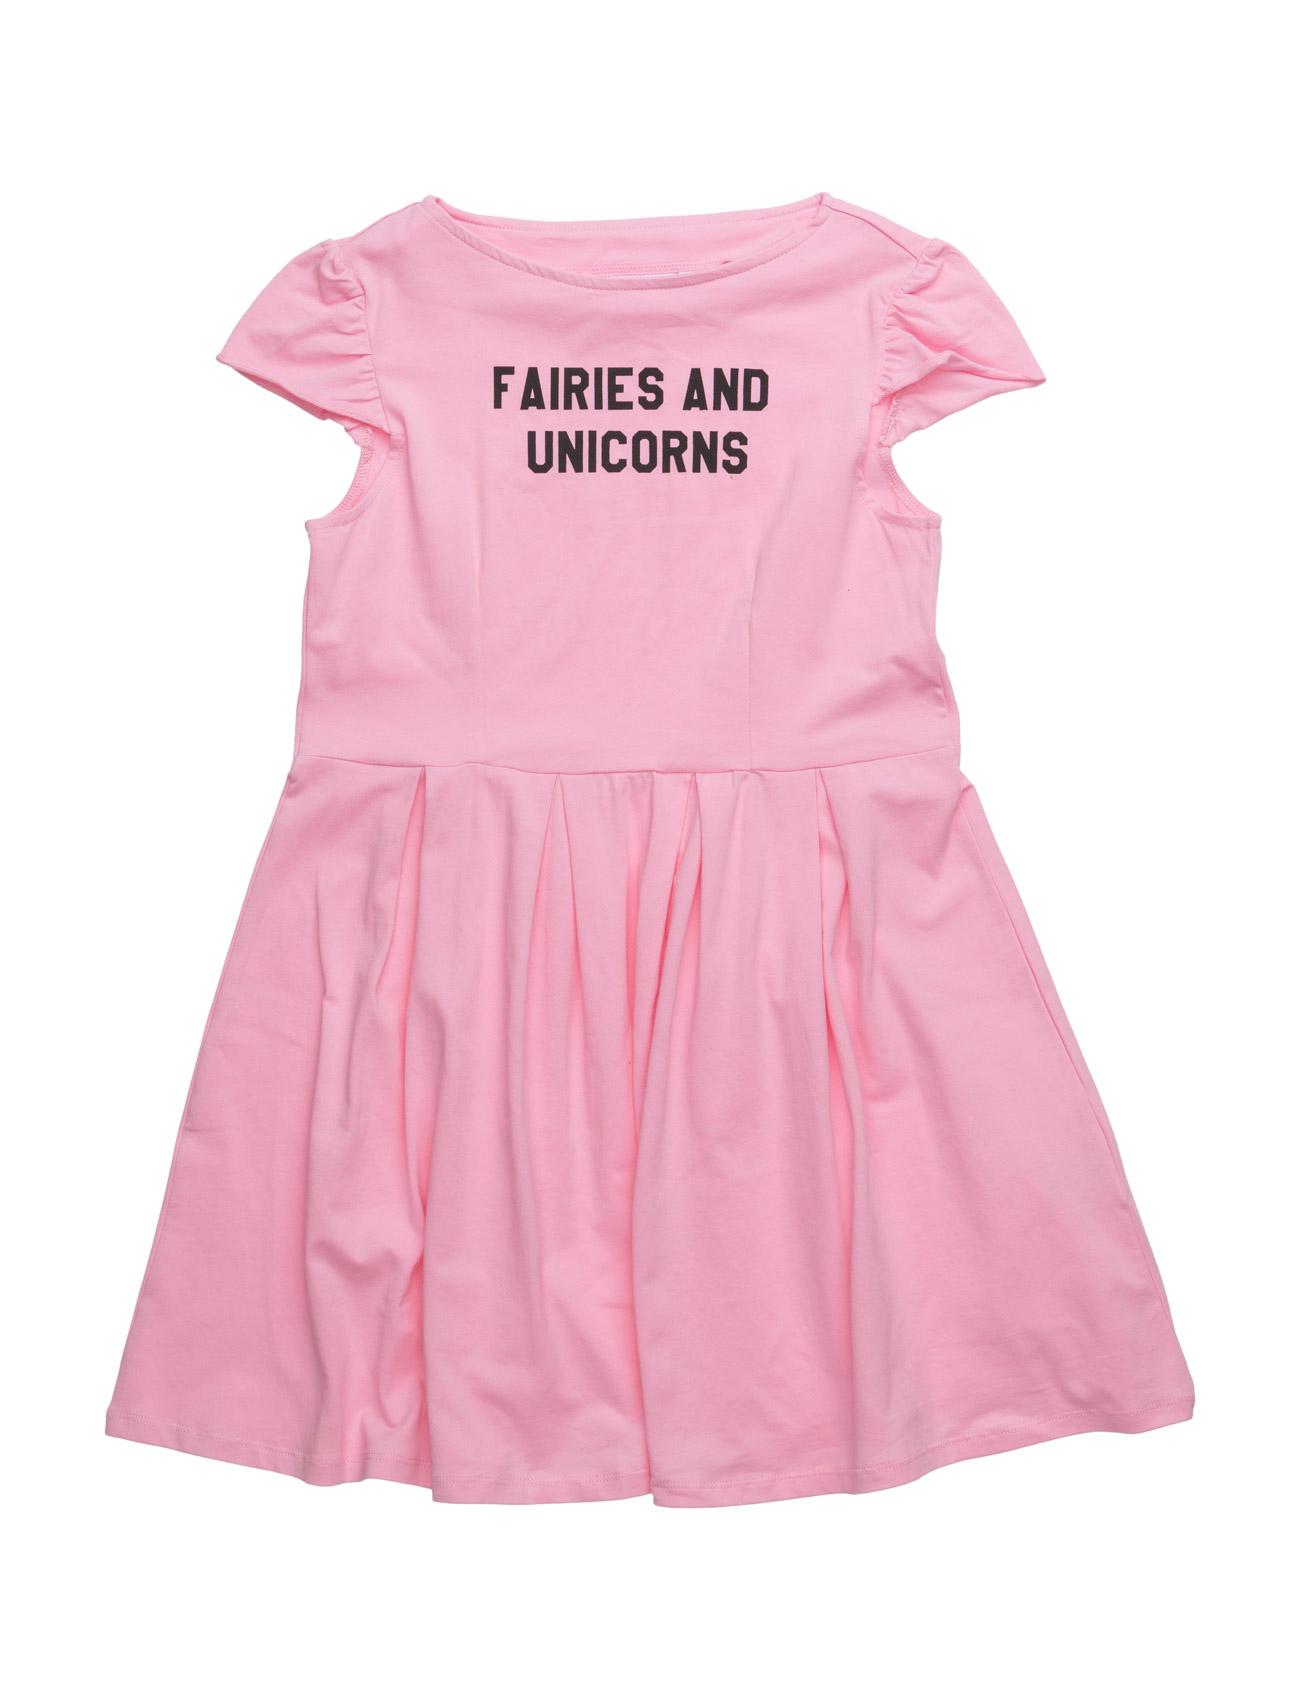 gardner & the gang Swirl dress fairies and unicorns på boozt.com dk